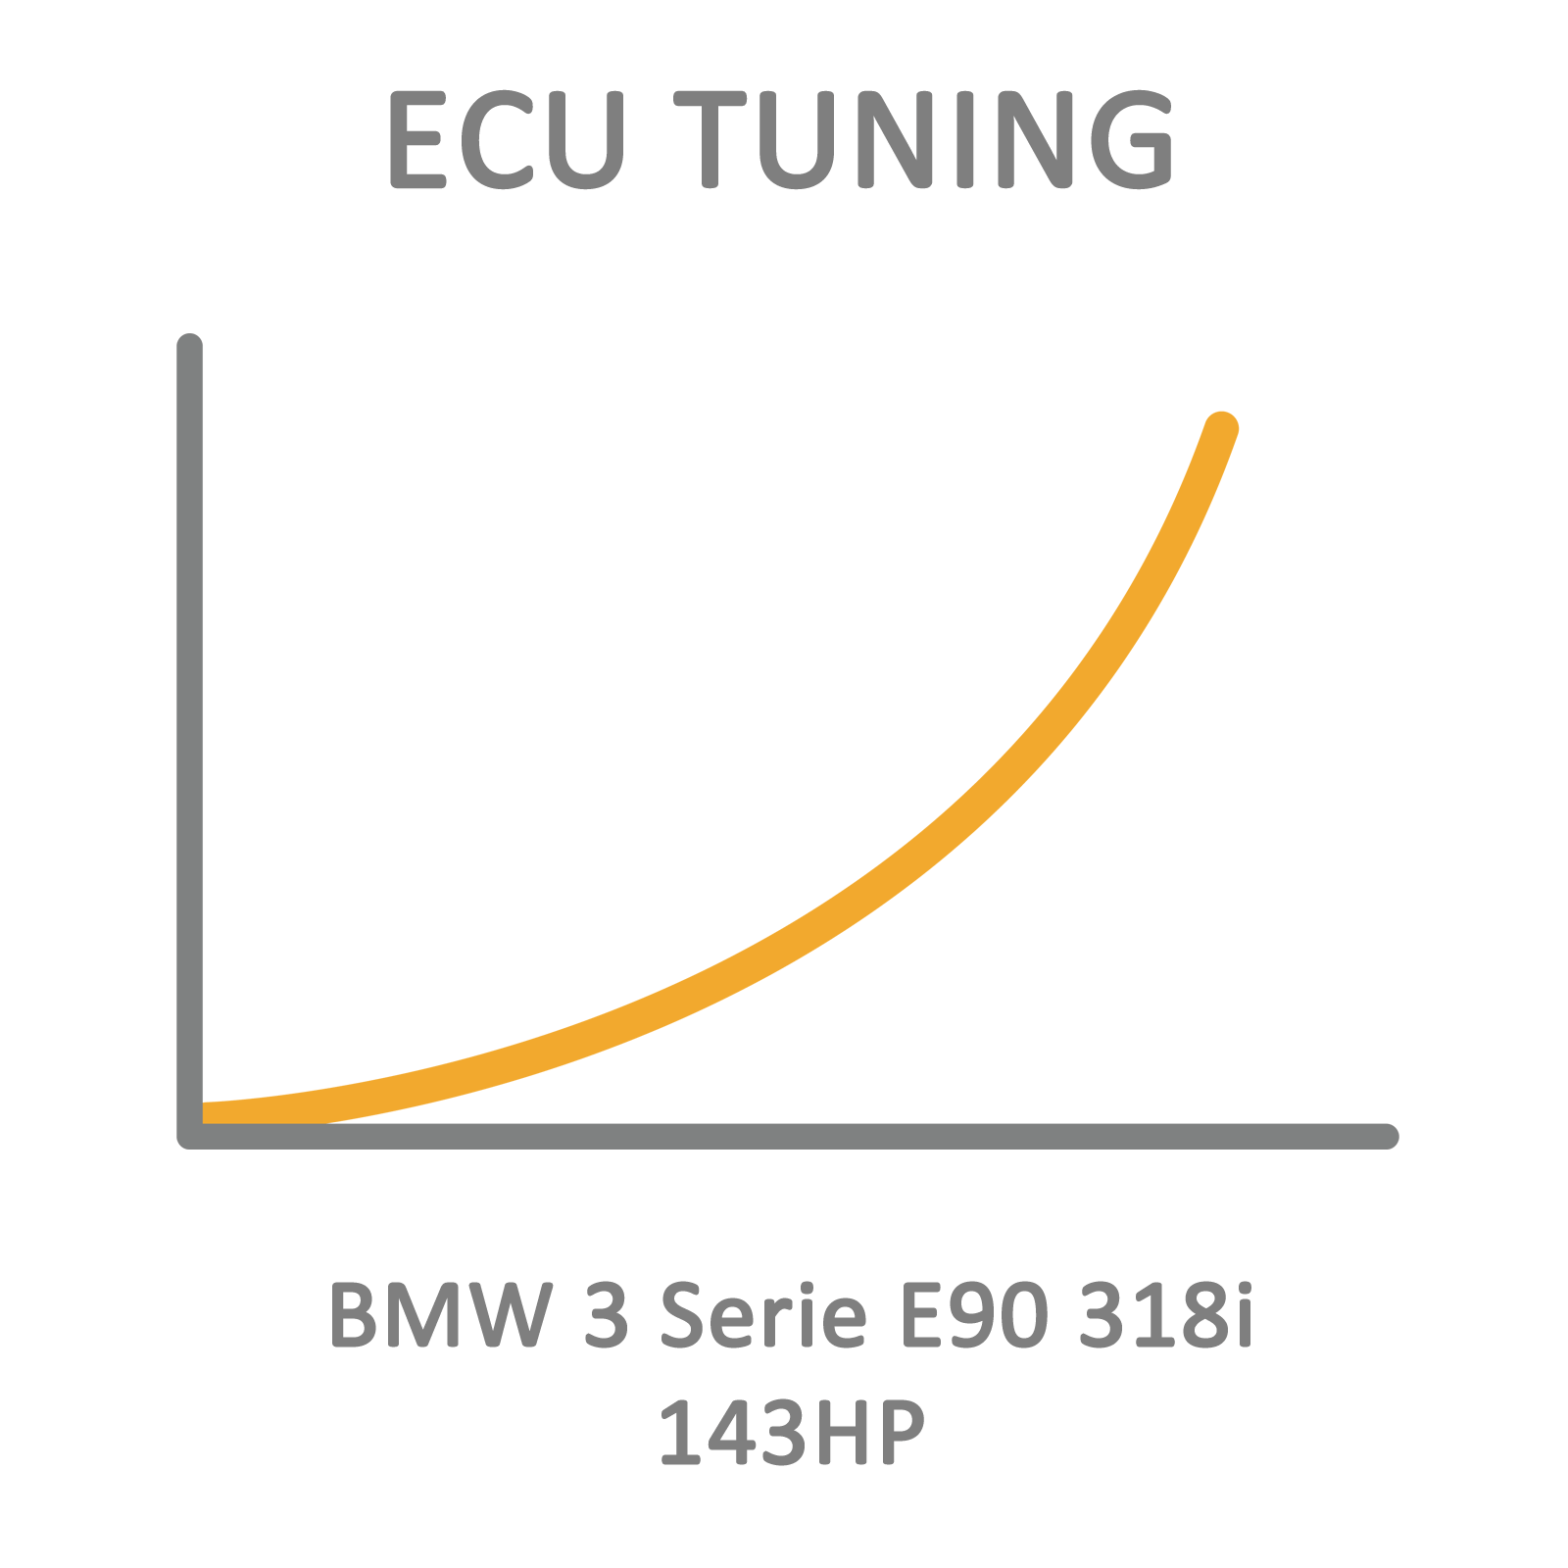 BMW 3 Series E90 318i 143HP ECU Tuning Remapping Programming